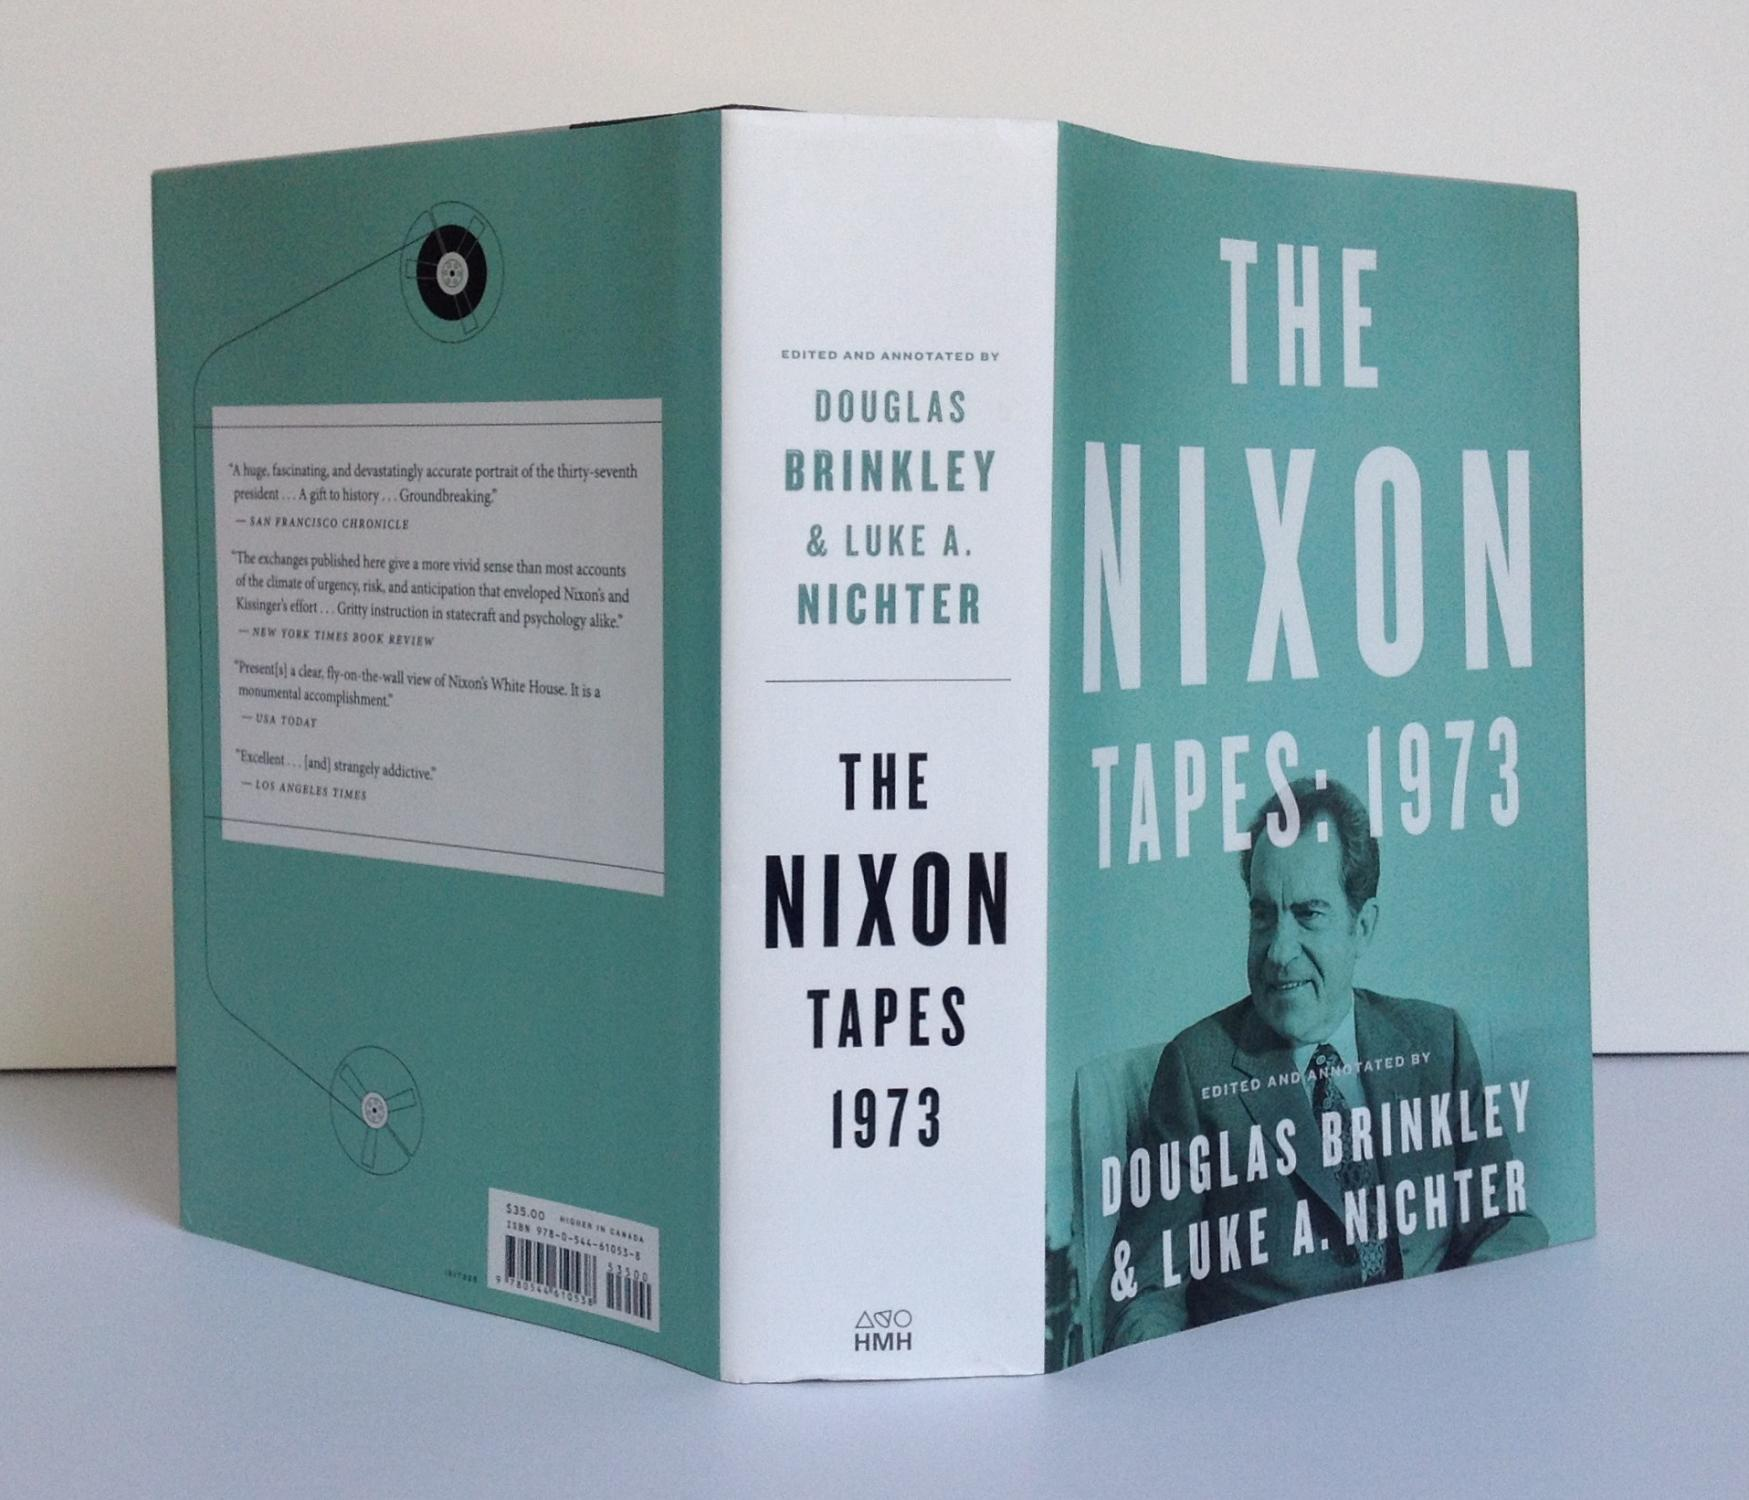 The Nixon Tapes 1973